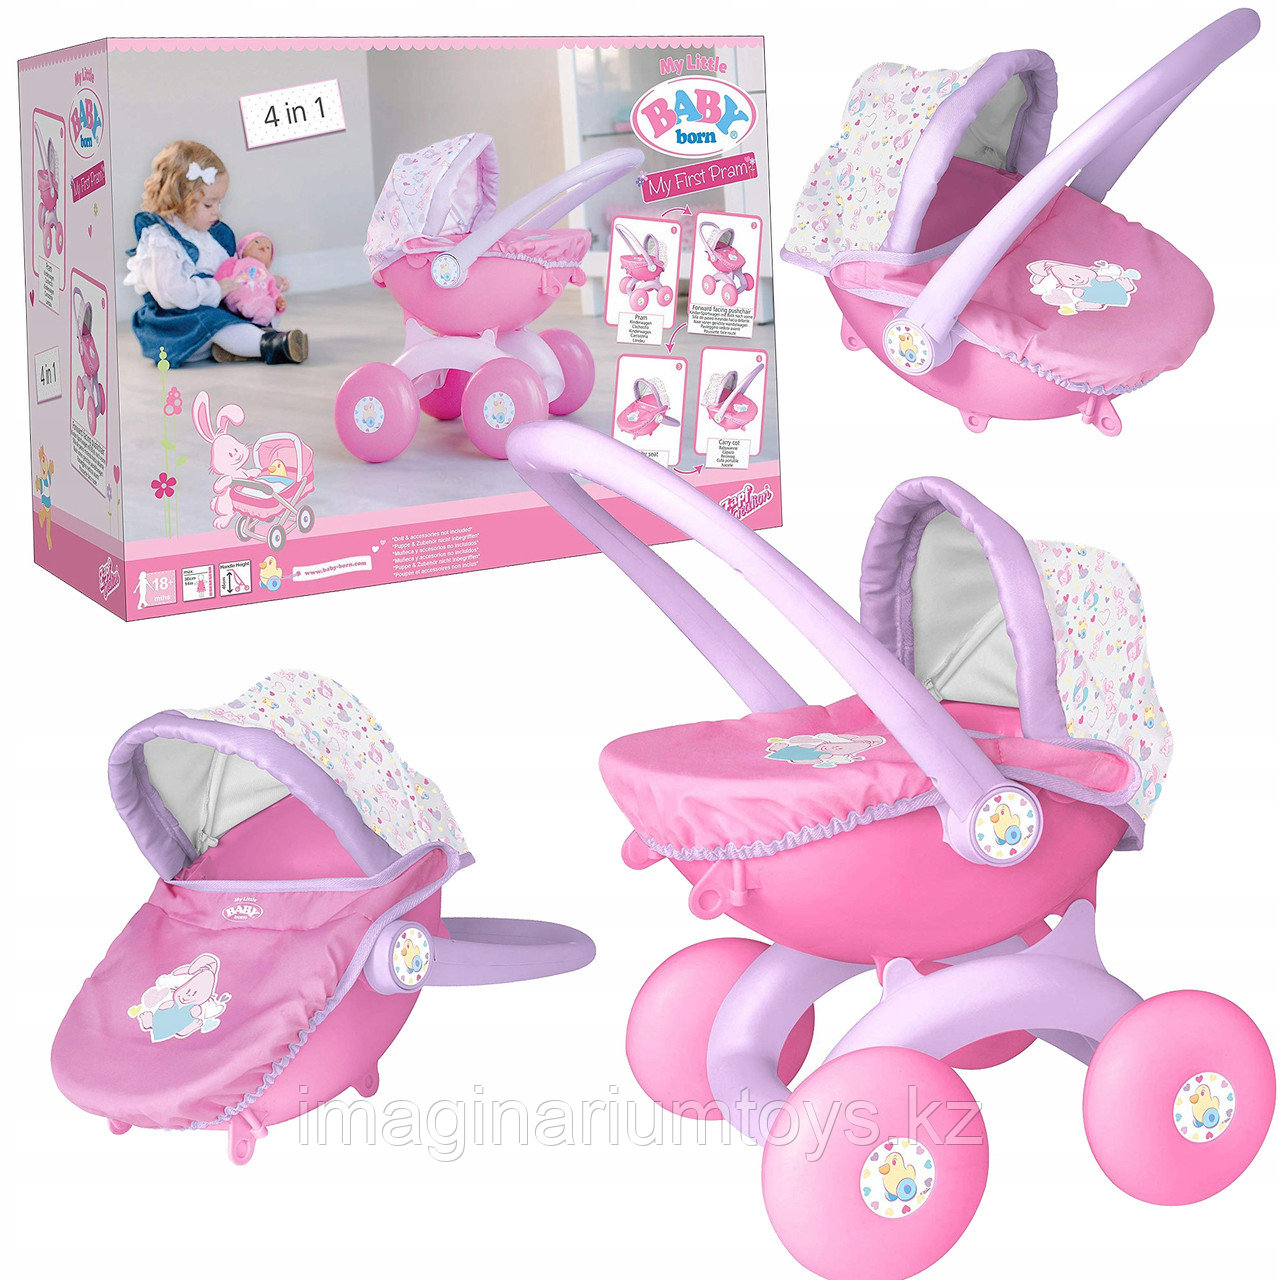 Коляска для кукол Беби Борн 4 в 1 Baby Born